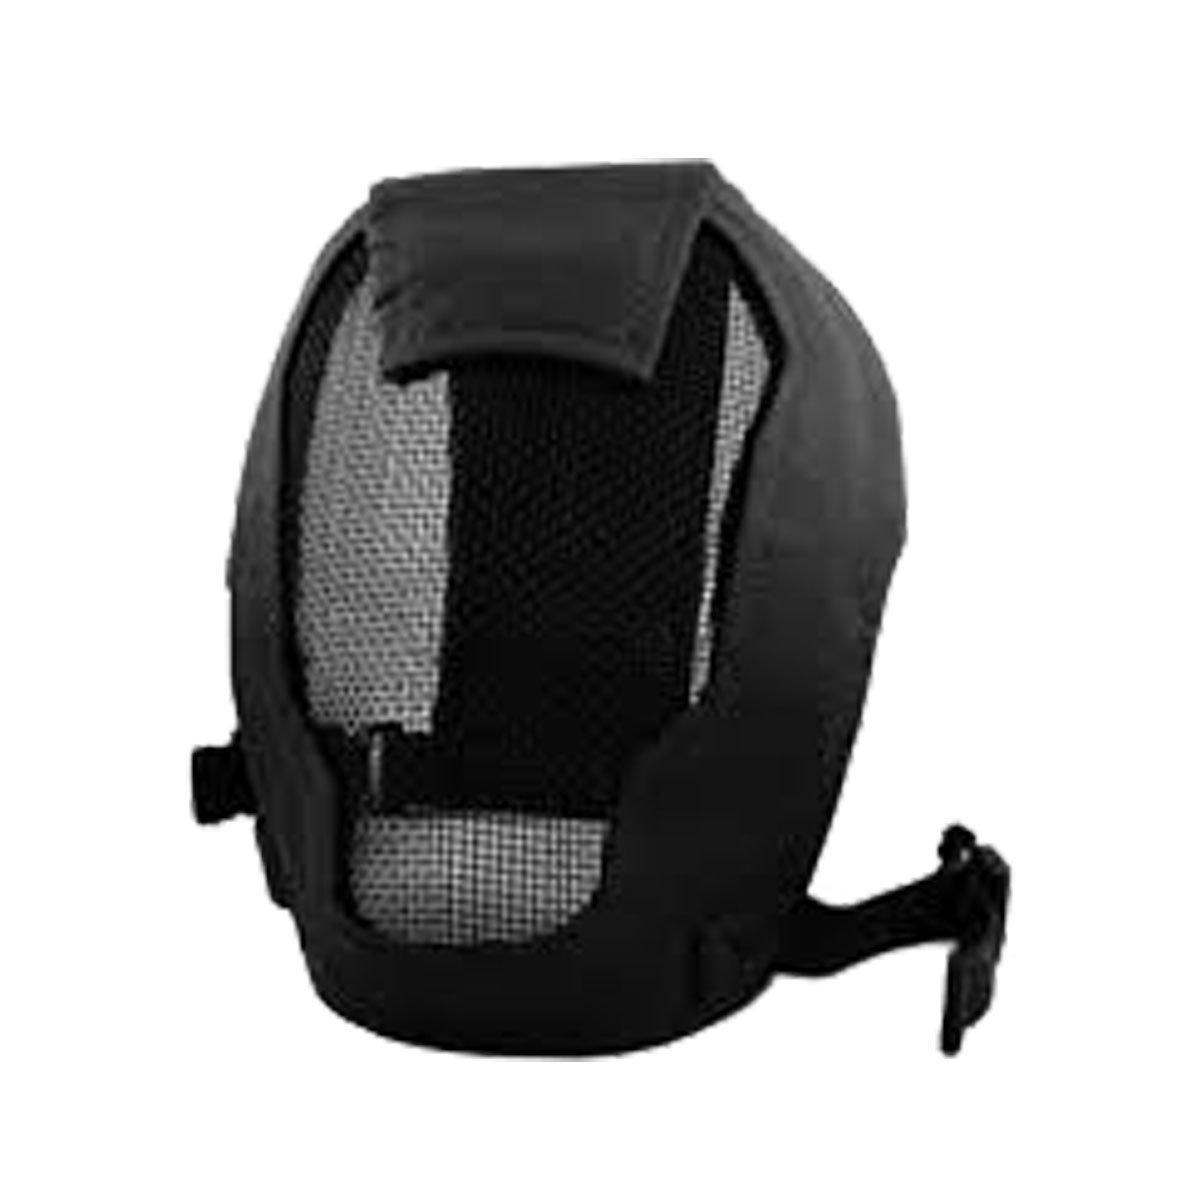 Máscara de Proteção Facial Completa Mesh Mask Full Face V1